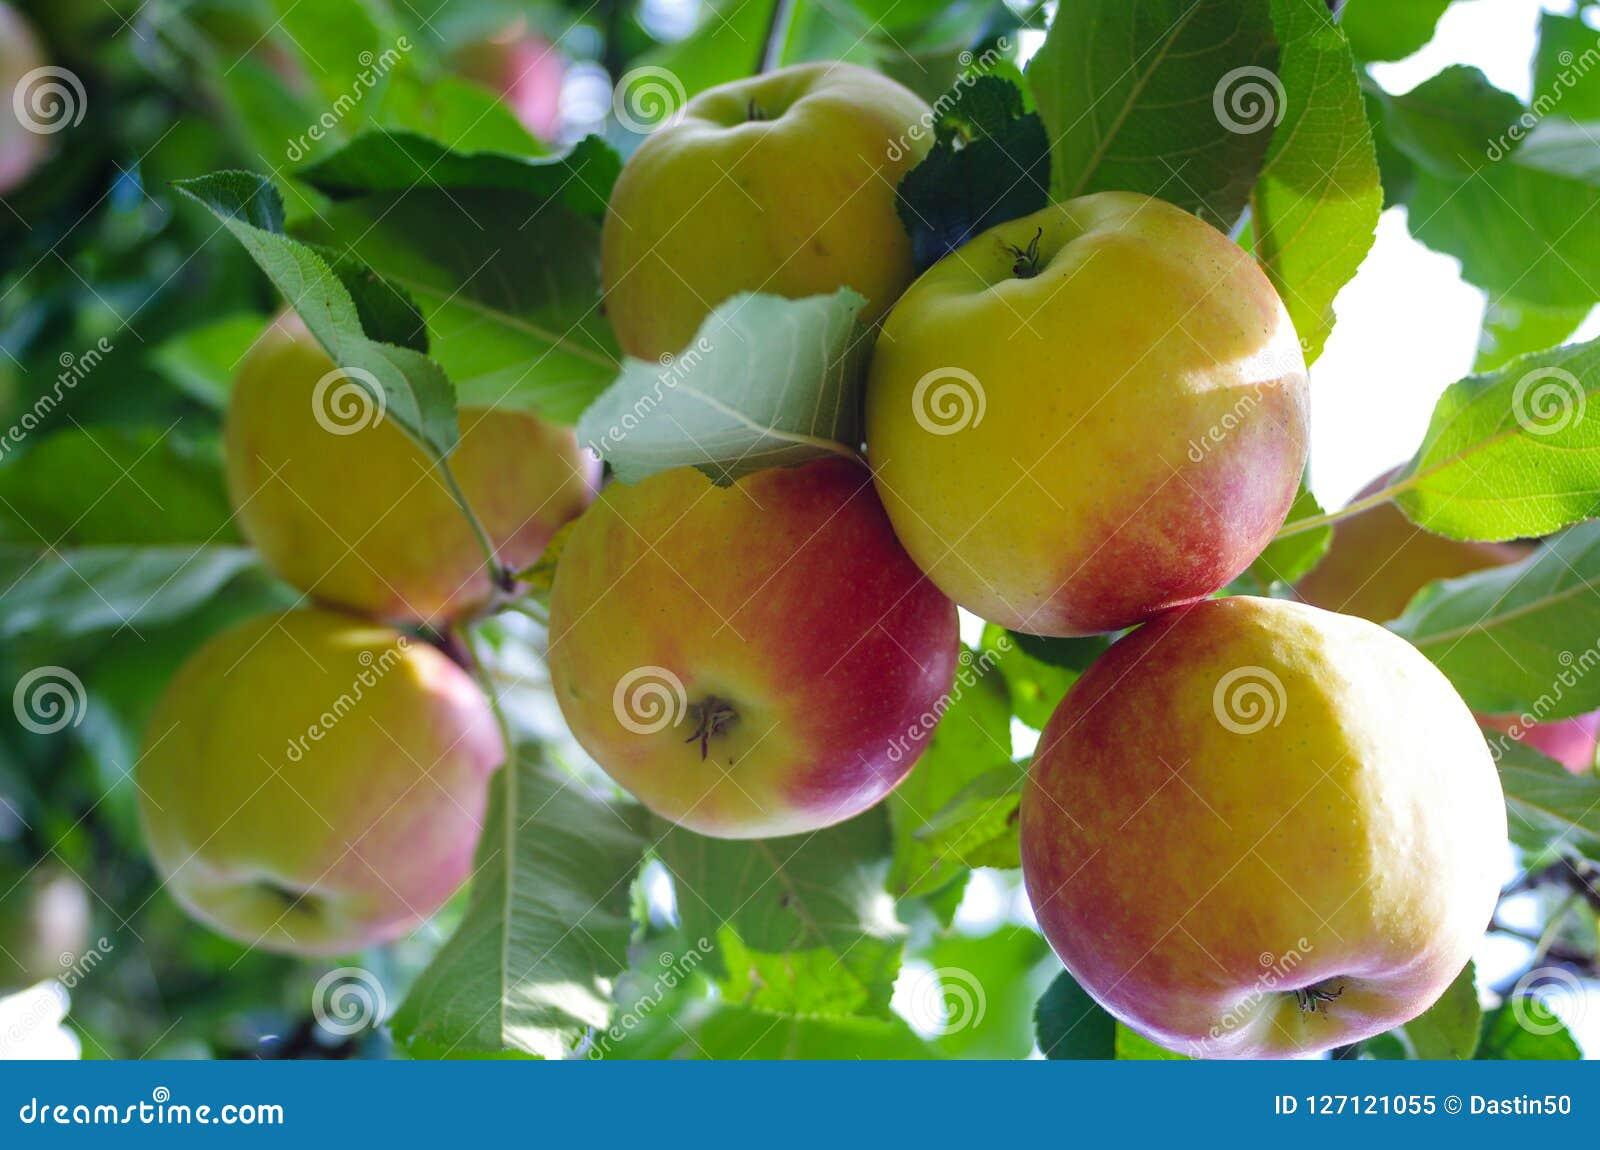 Bohemia Gold Apples